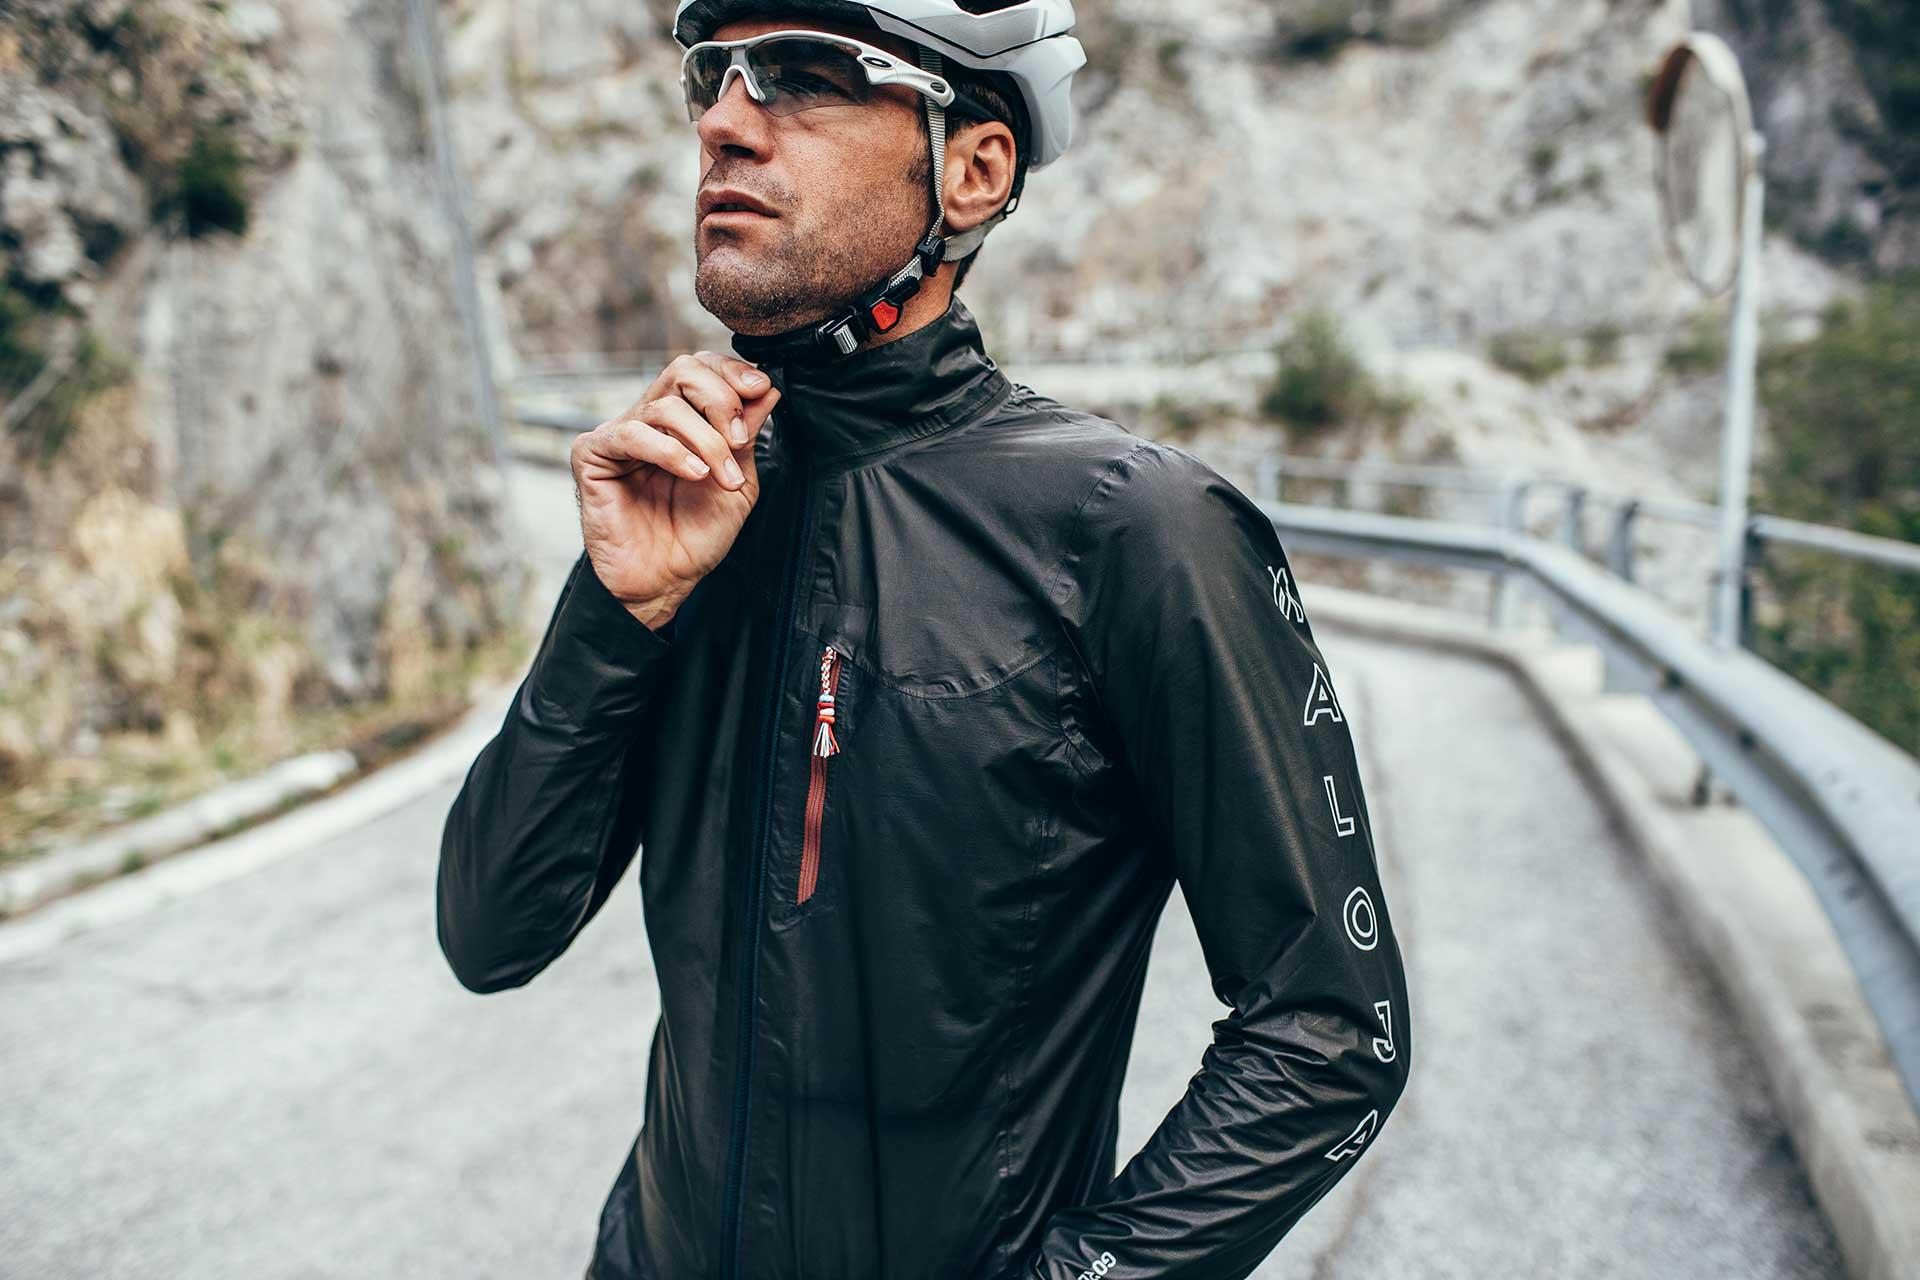 Funktionsbekleidung Fotograf Rennrad Sport Alpen Berge Outdoor Italien